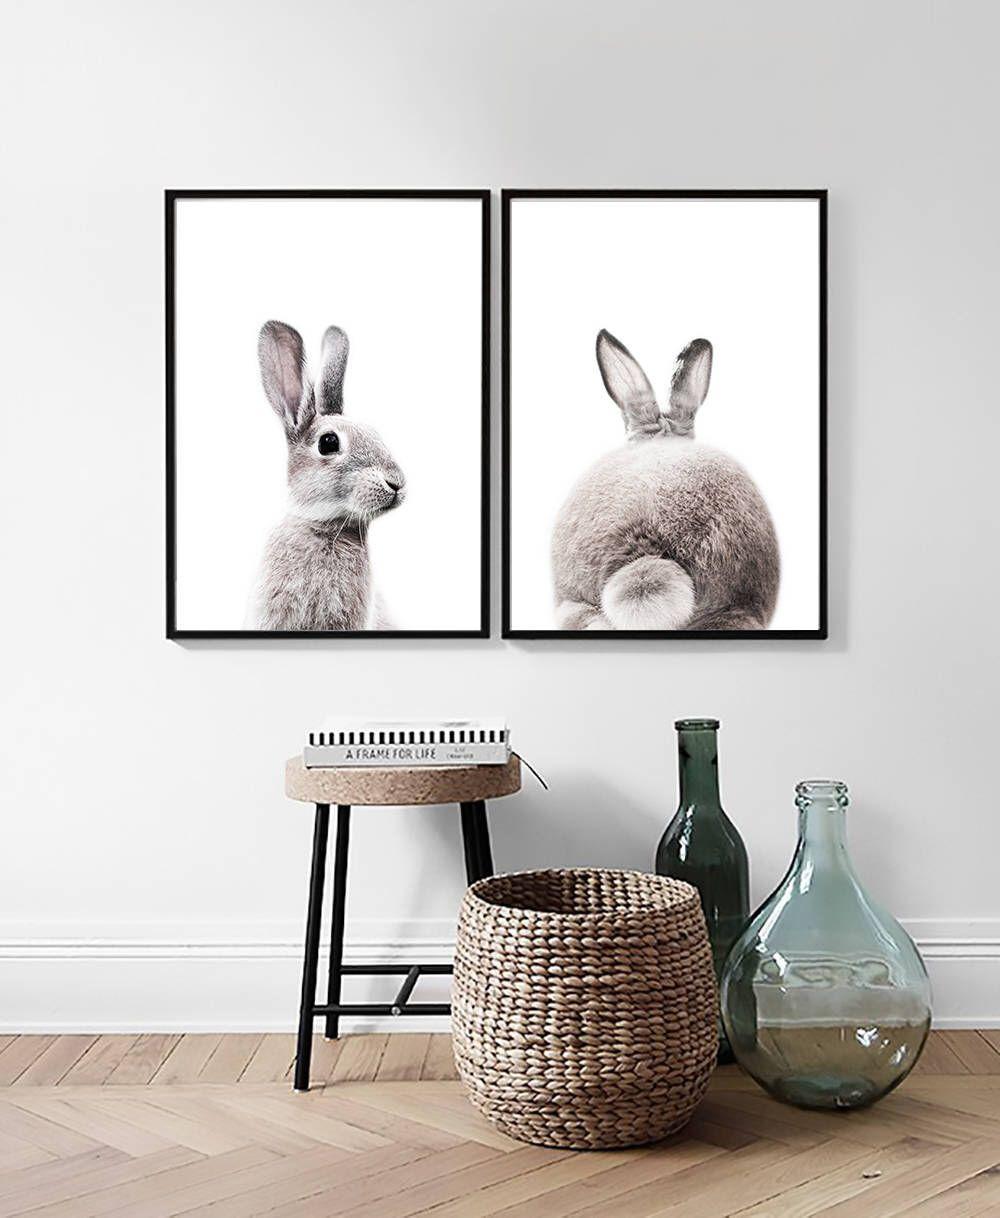 Bunny Print Rabbit Nursery Art Animal Wall Decor Animal Poster